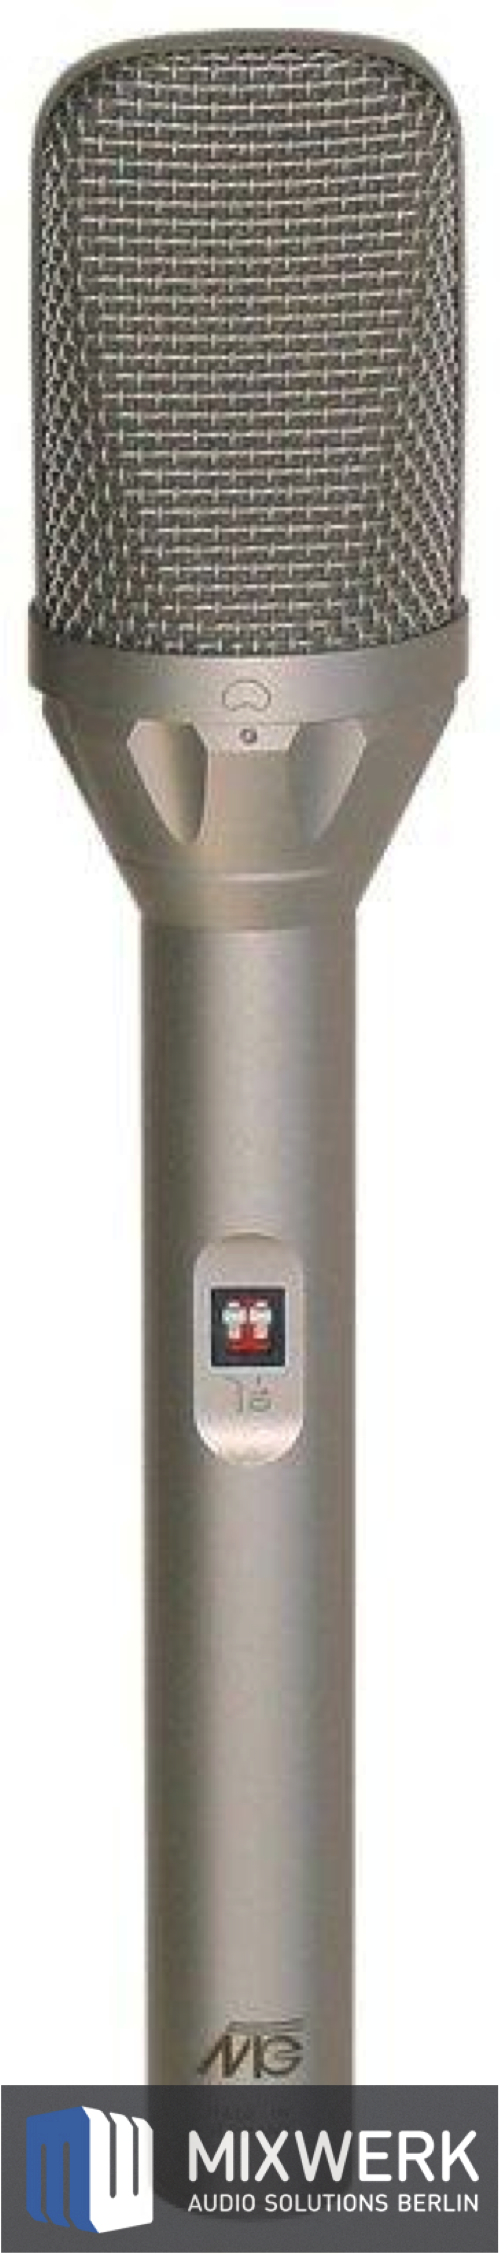 Best Mics For Vo Mixwerk Blog Dynamic Mic Preamplifier Circuit Type Condenser Microphone Pressure Gradient Polar Pattern Cardioid Frequency Response 40 Hz To 18 Khz Maximum Spl 144 Db